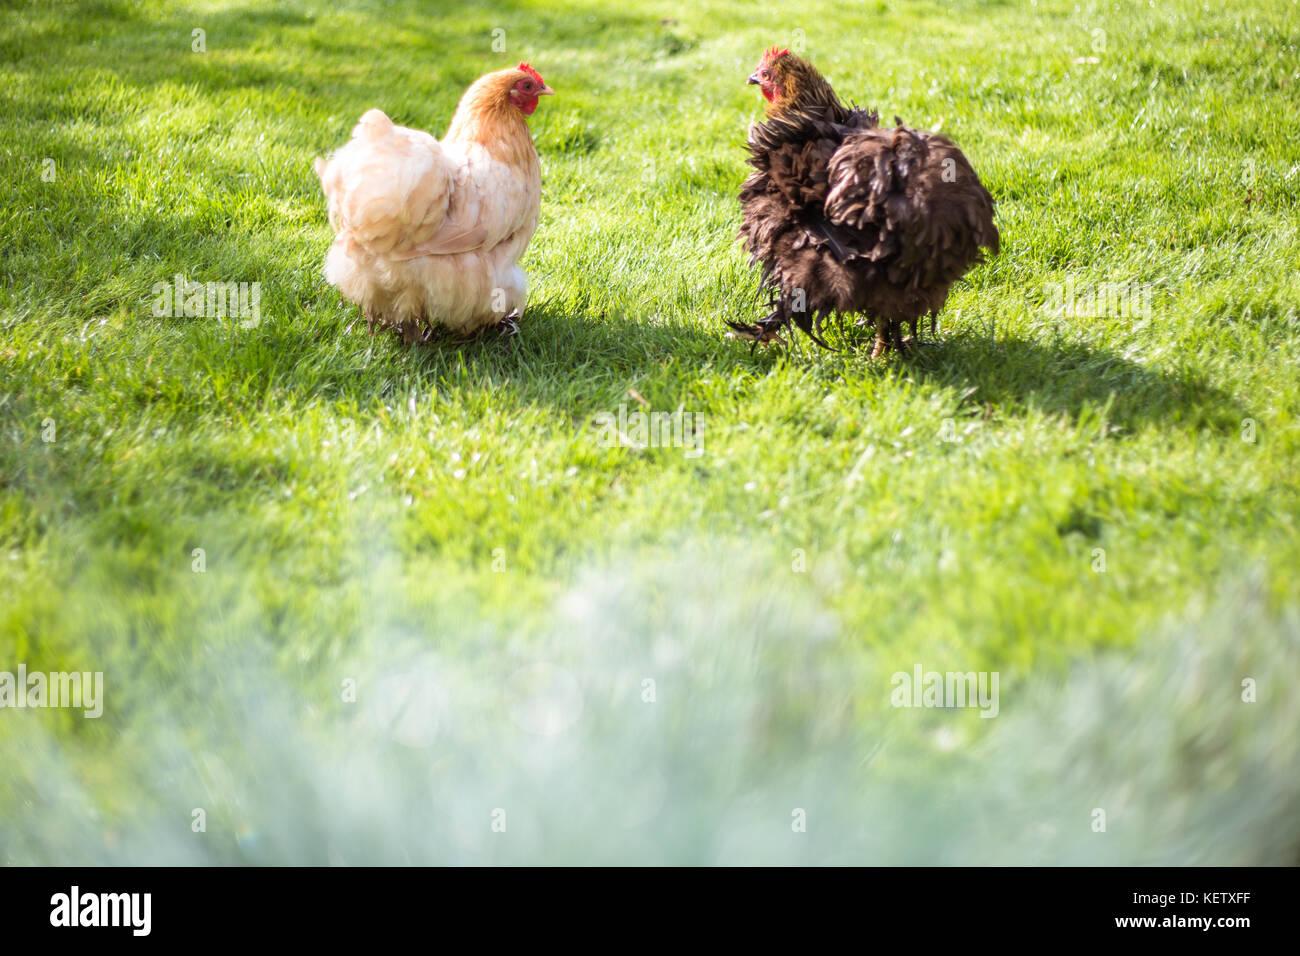 Pet Bantam chickens in back garden - Stock Image